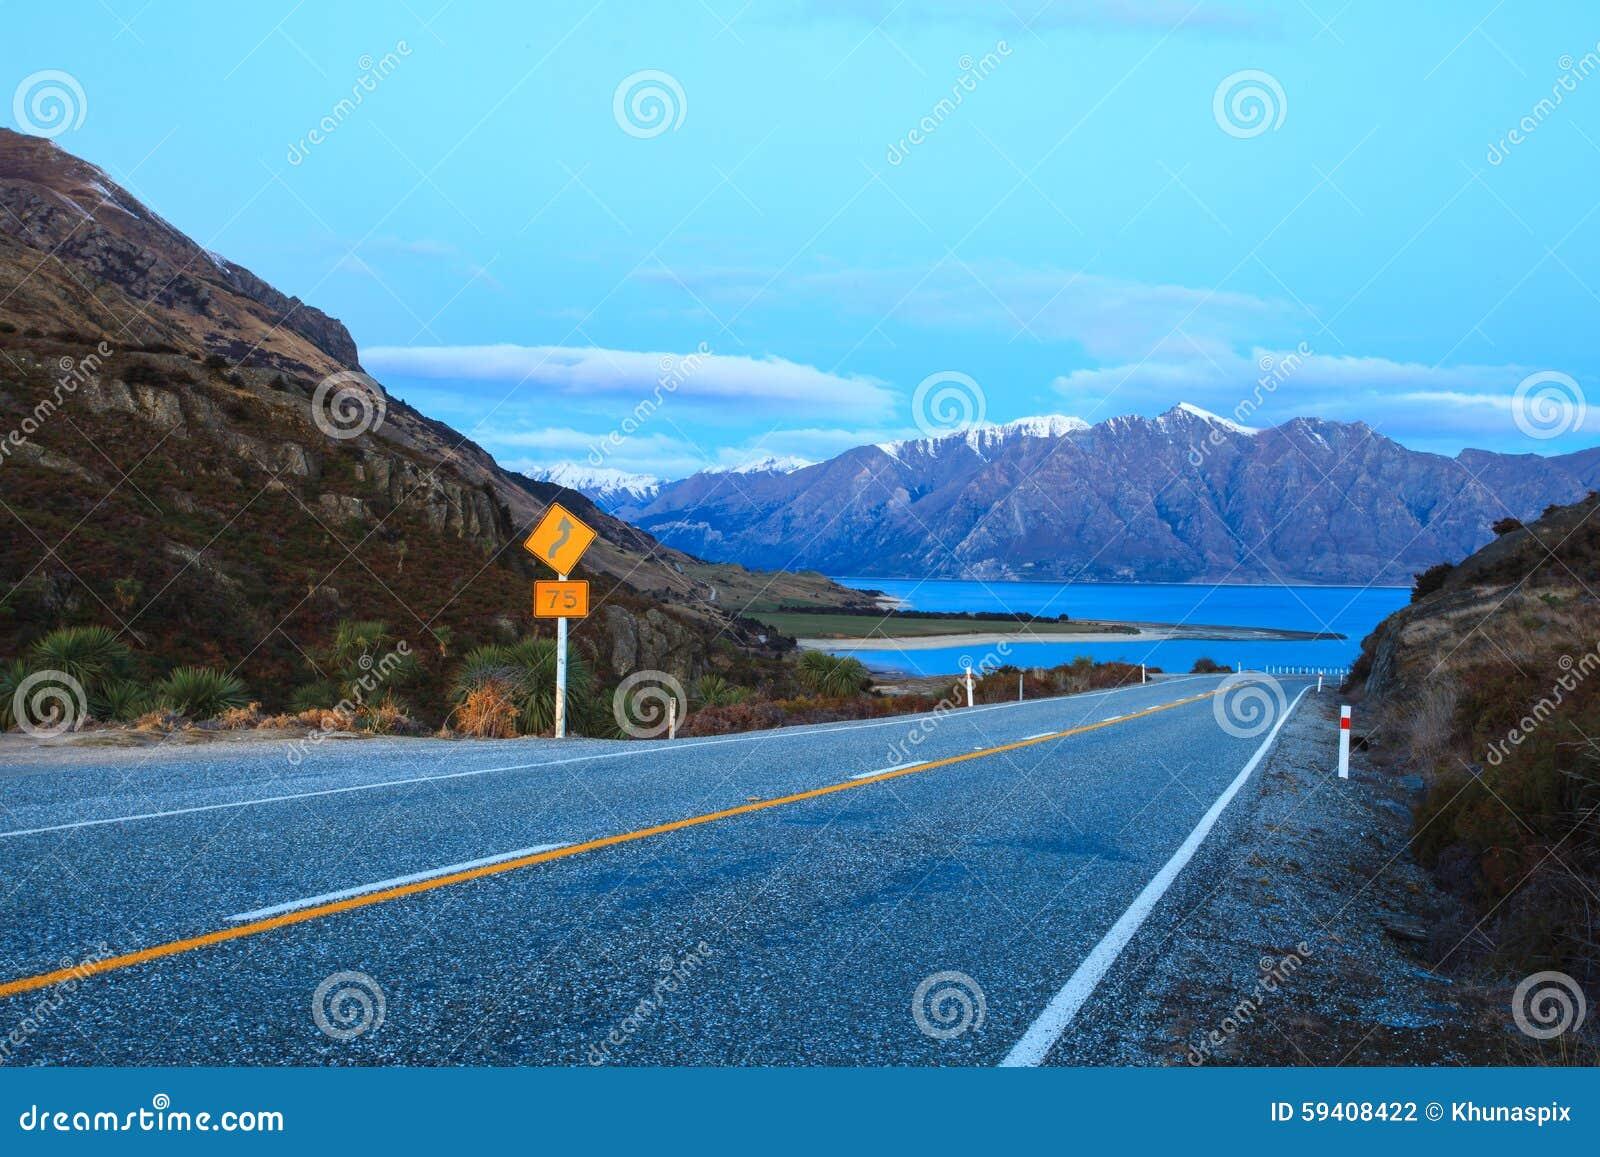 Destination To New Zealand South Island